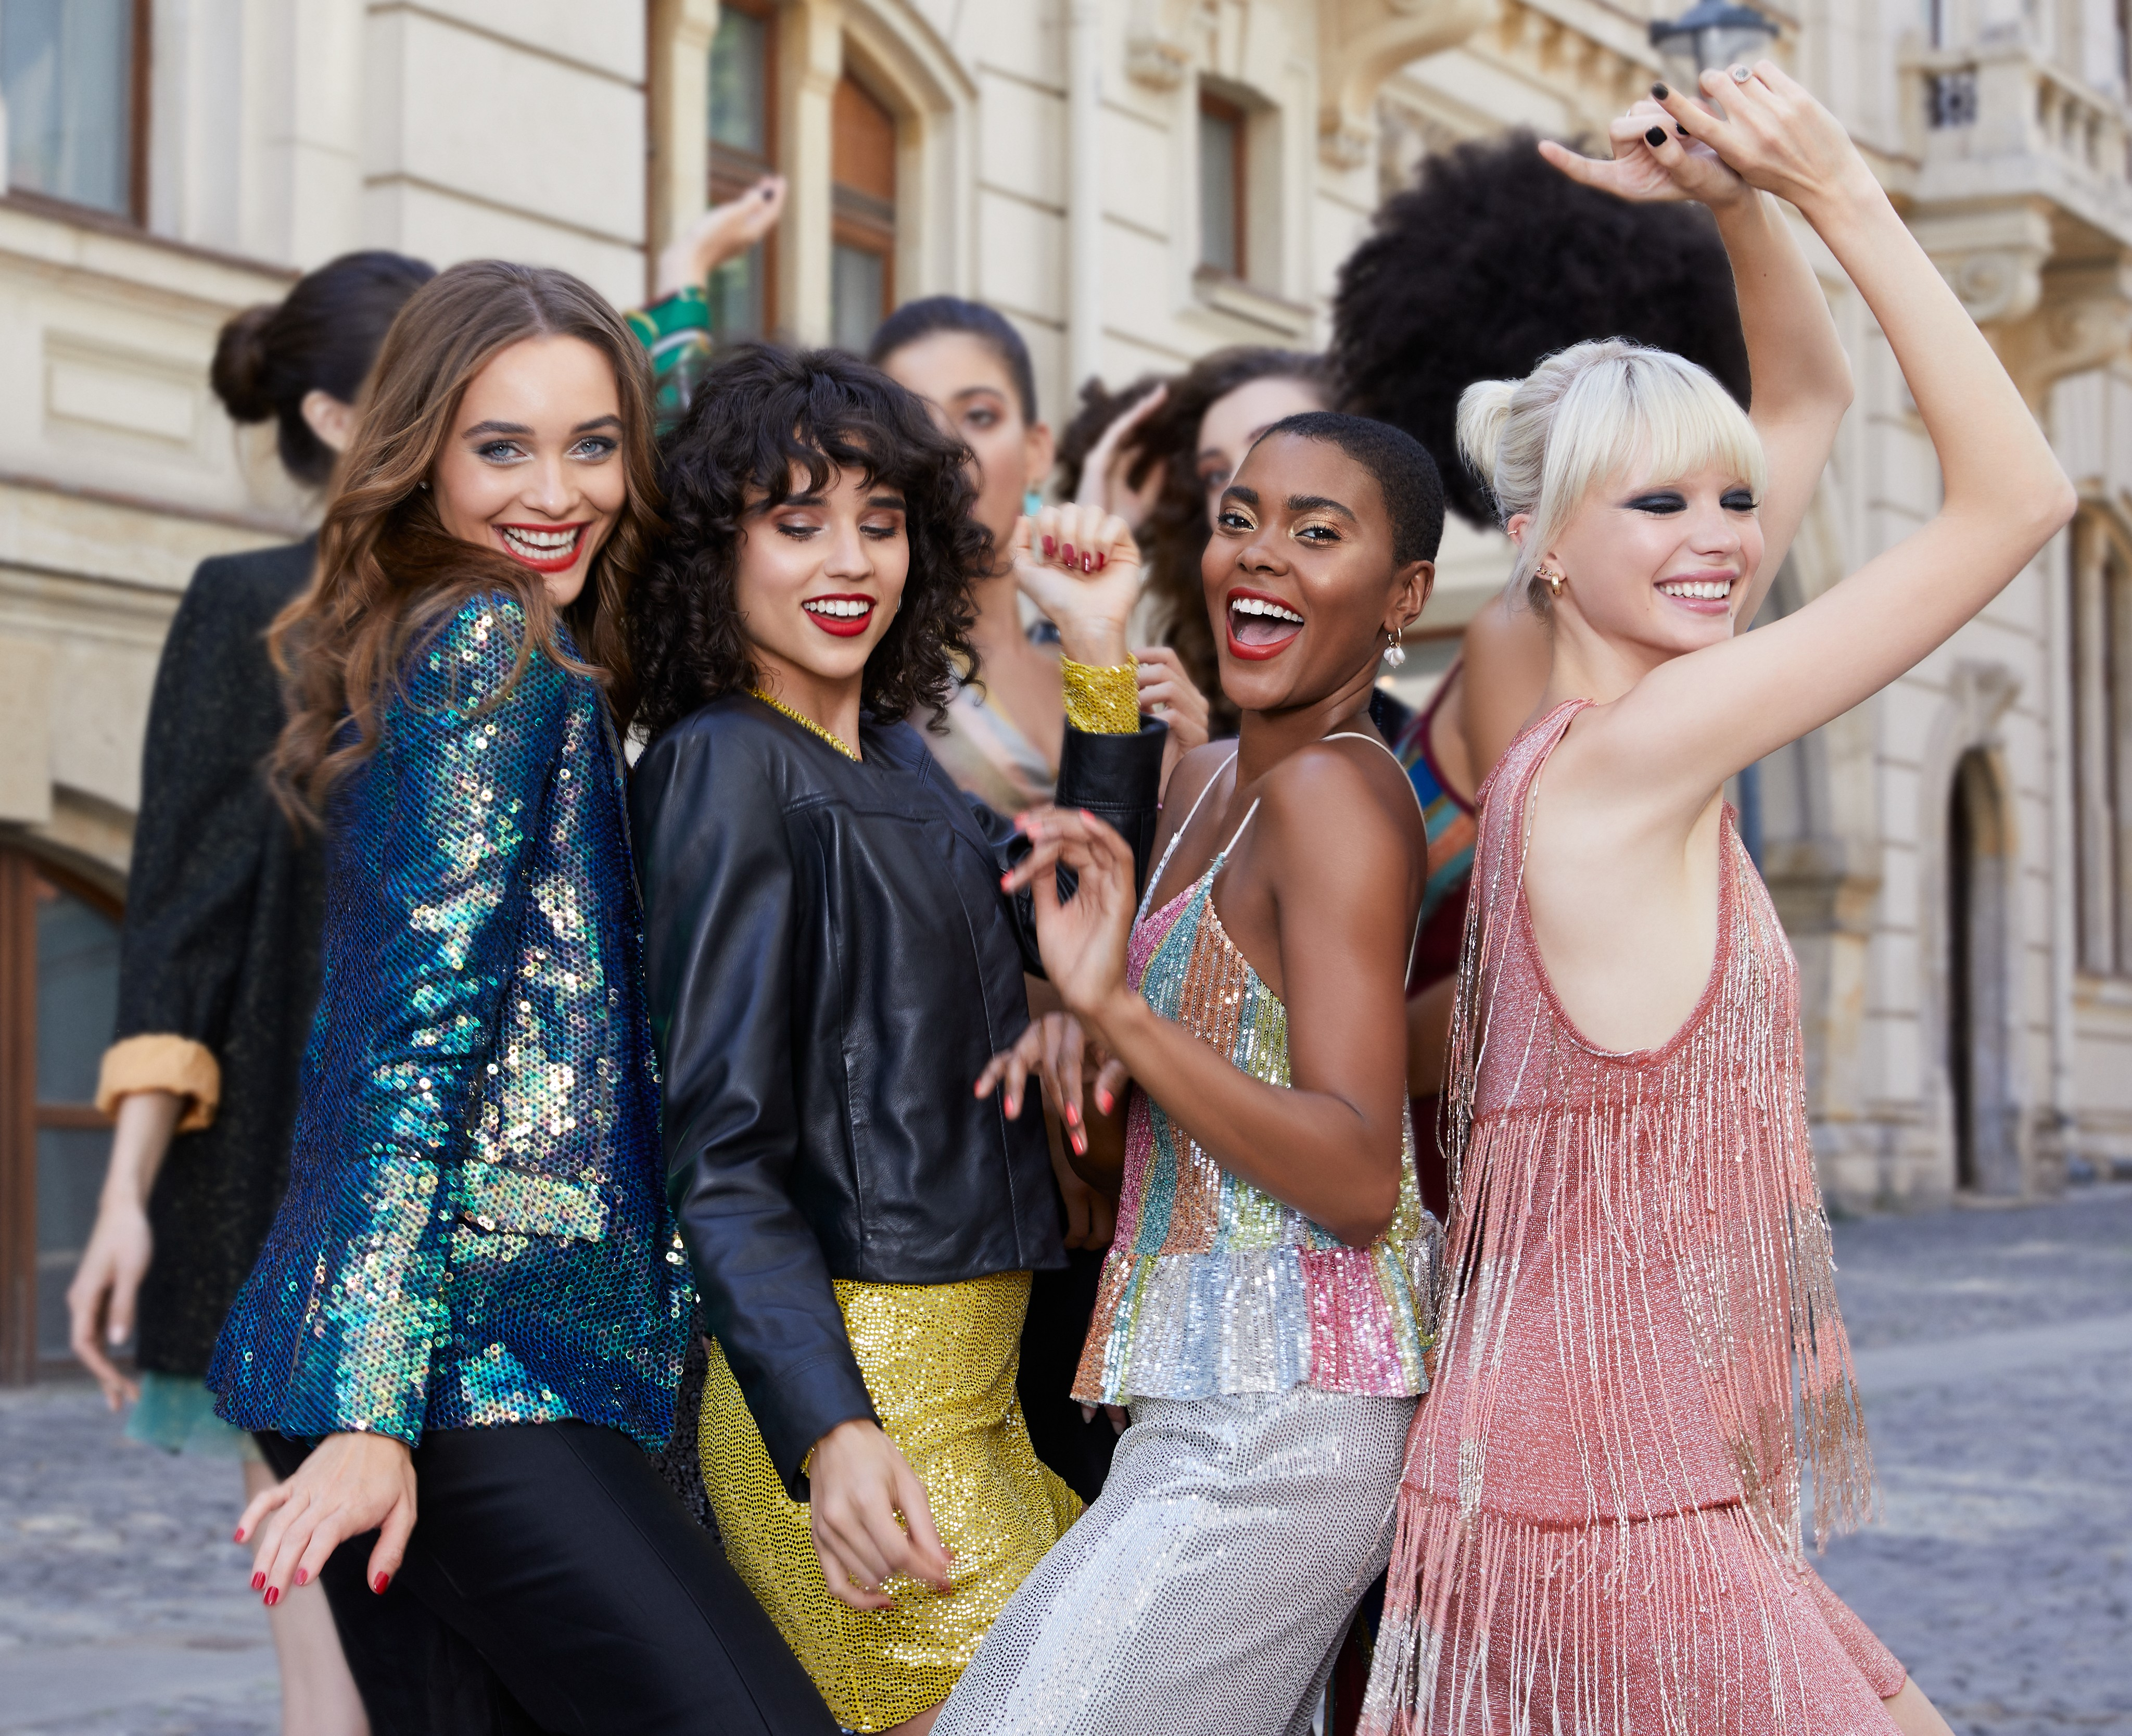 Makeup-beautyvisual-singles-day-girls-dance-261020-301120-Web-Rendition-2